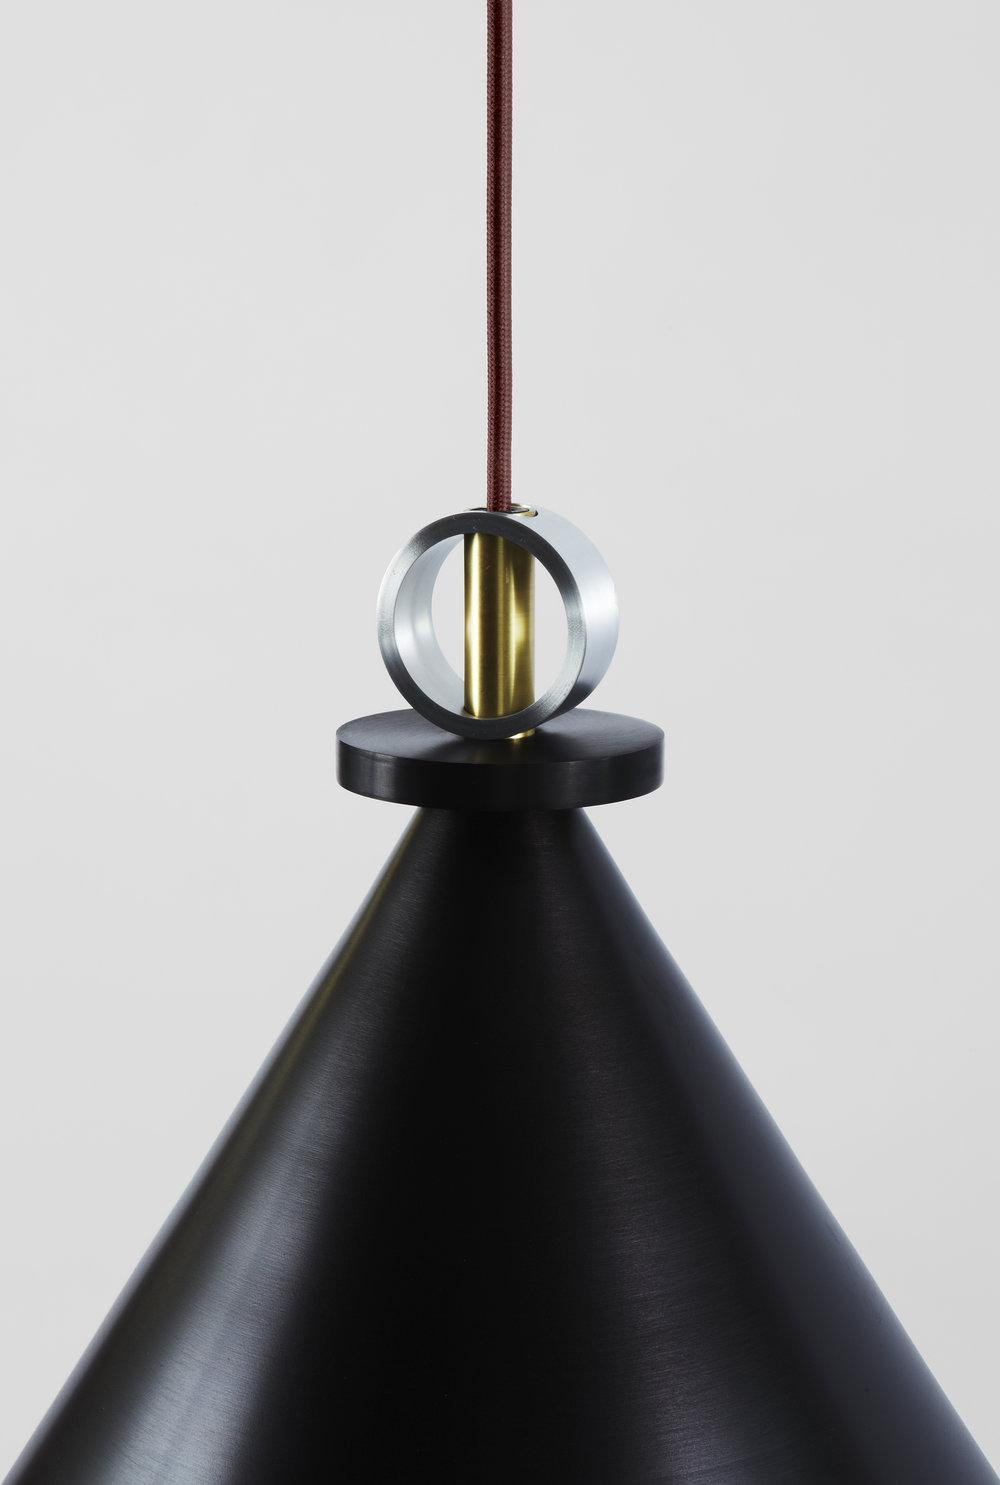 Black Cone Detail.jpg